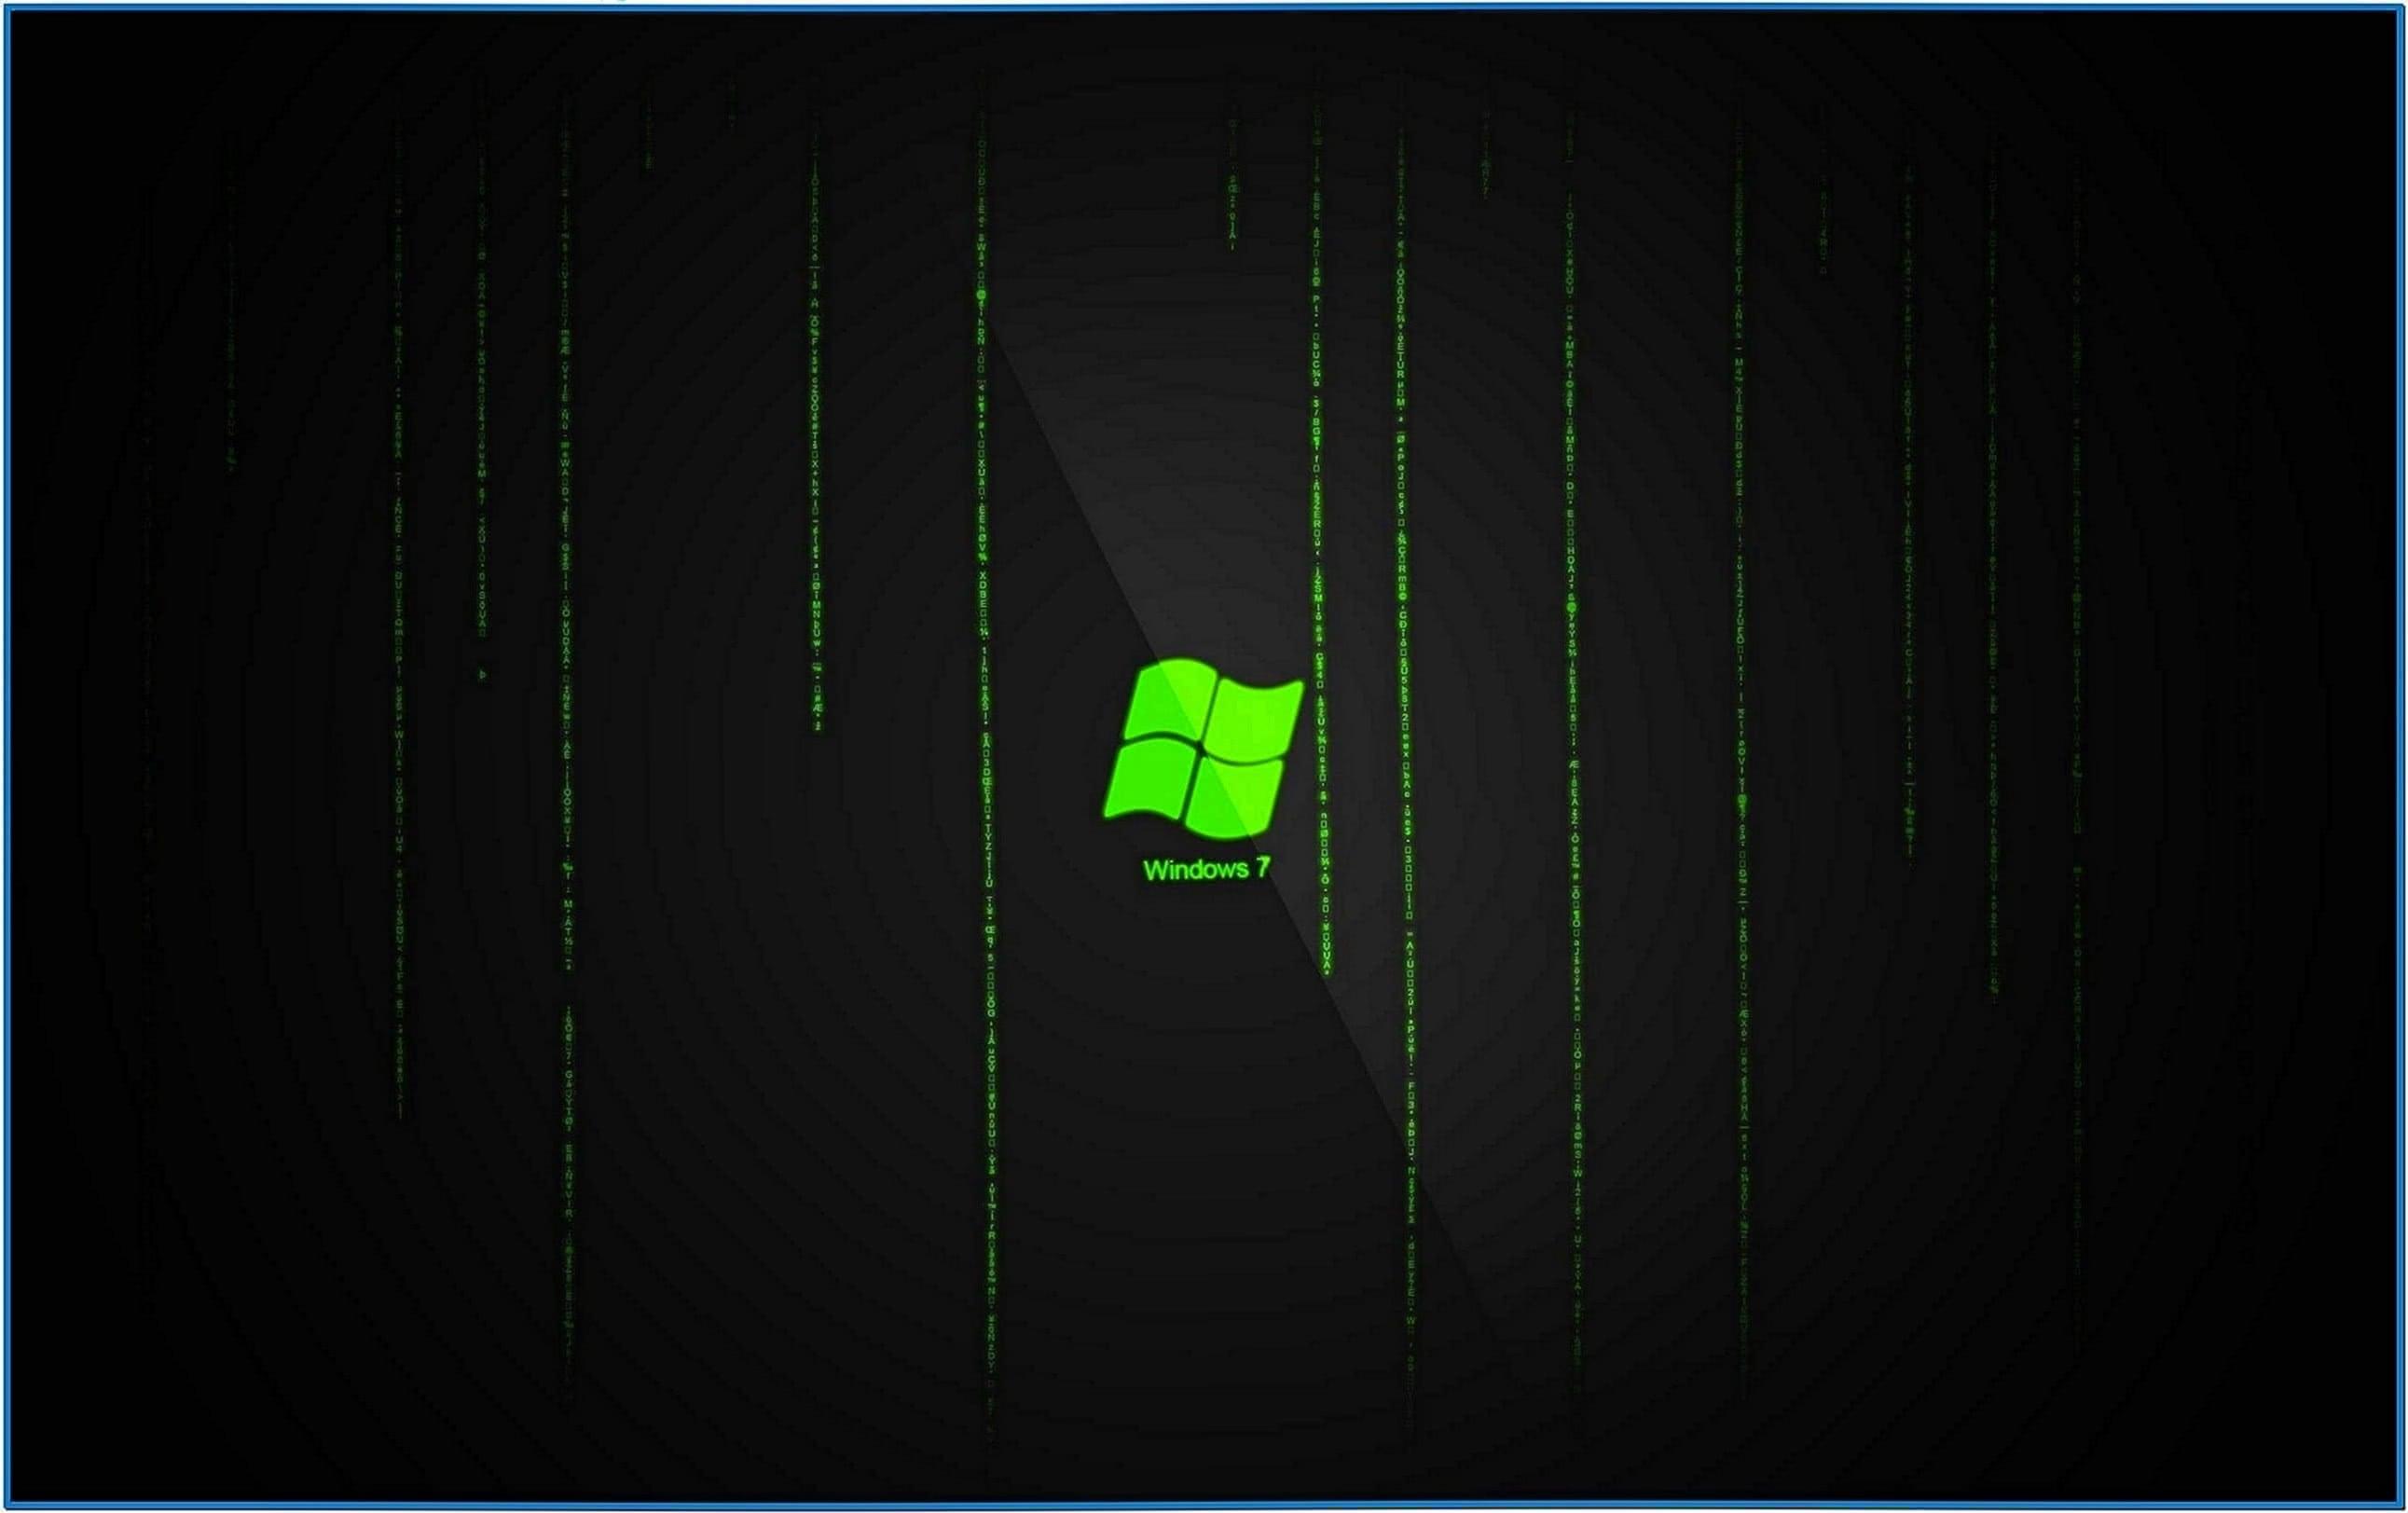 Hd matrix screensaver Windows 7